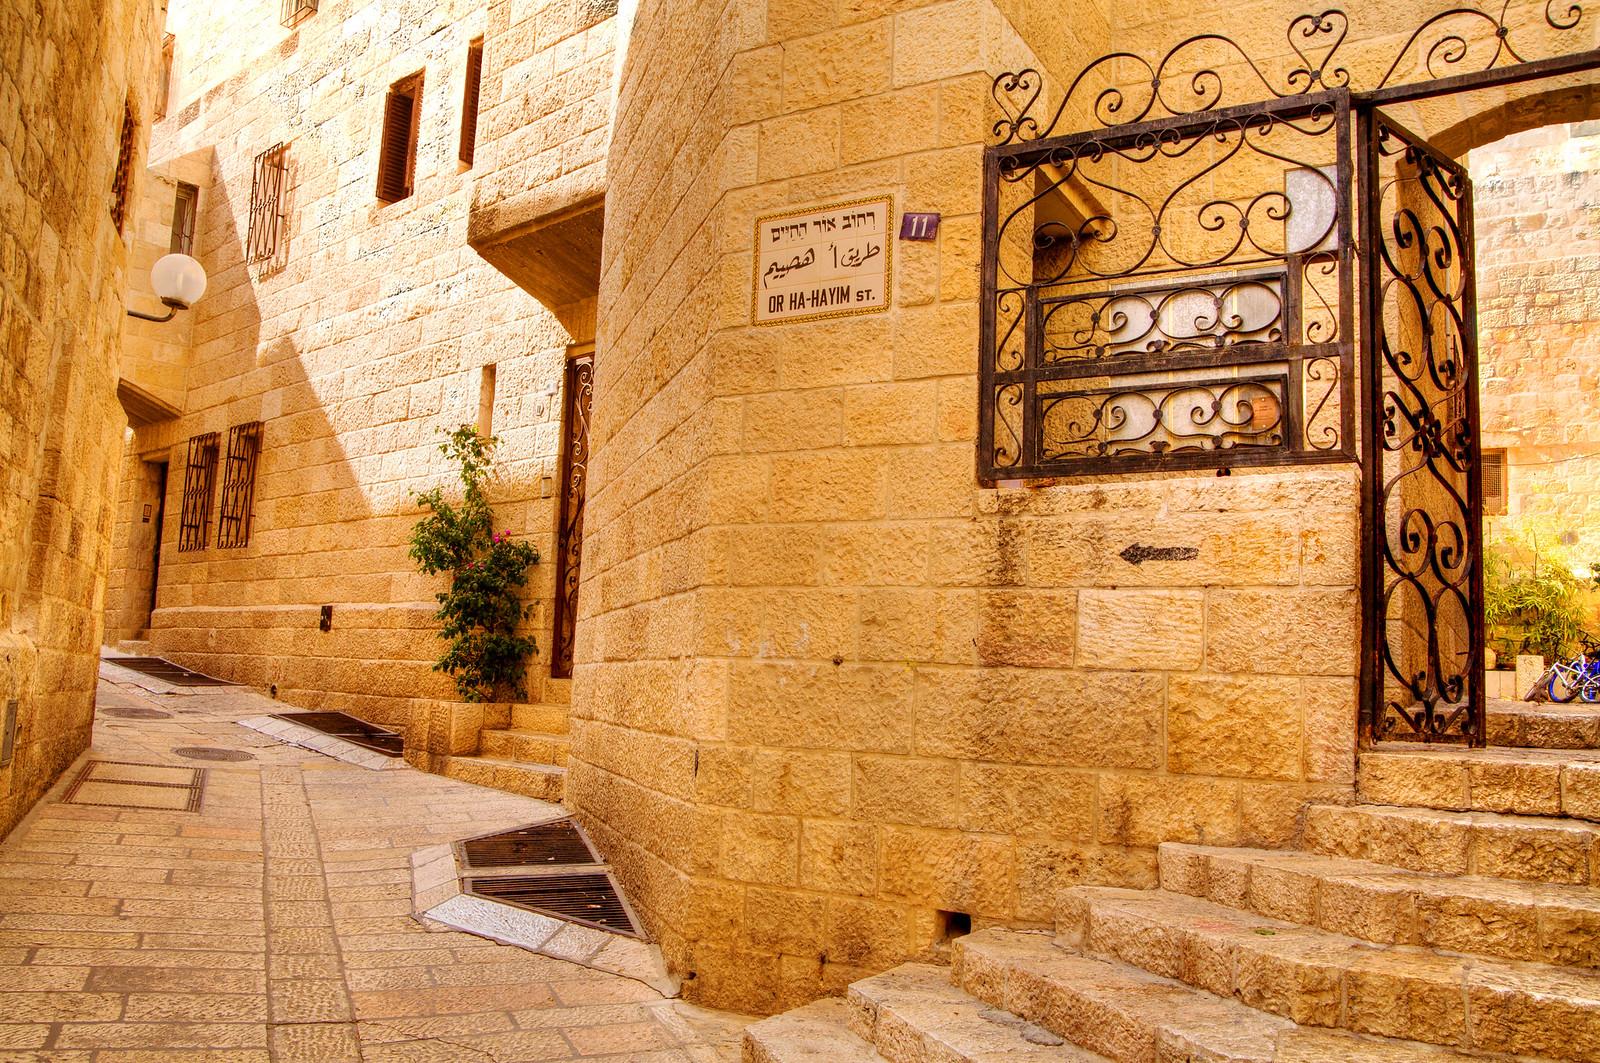 Jerusalem_Old City_Jewish Quater_3_Noam Chen_IMOT